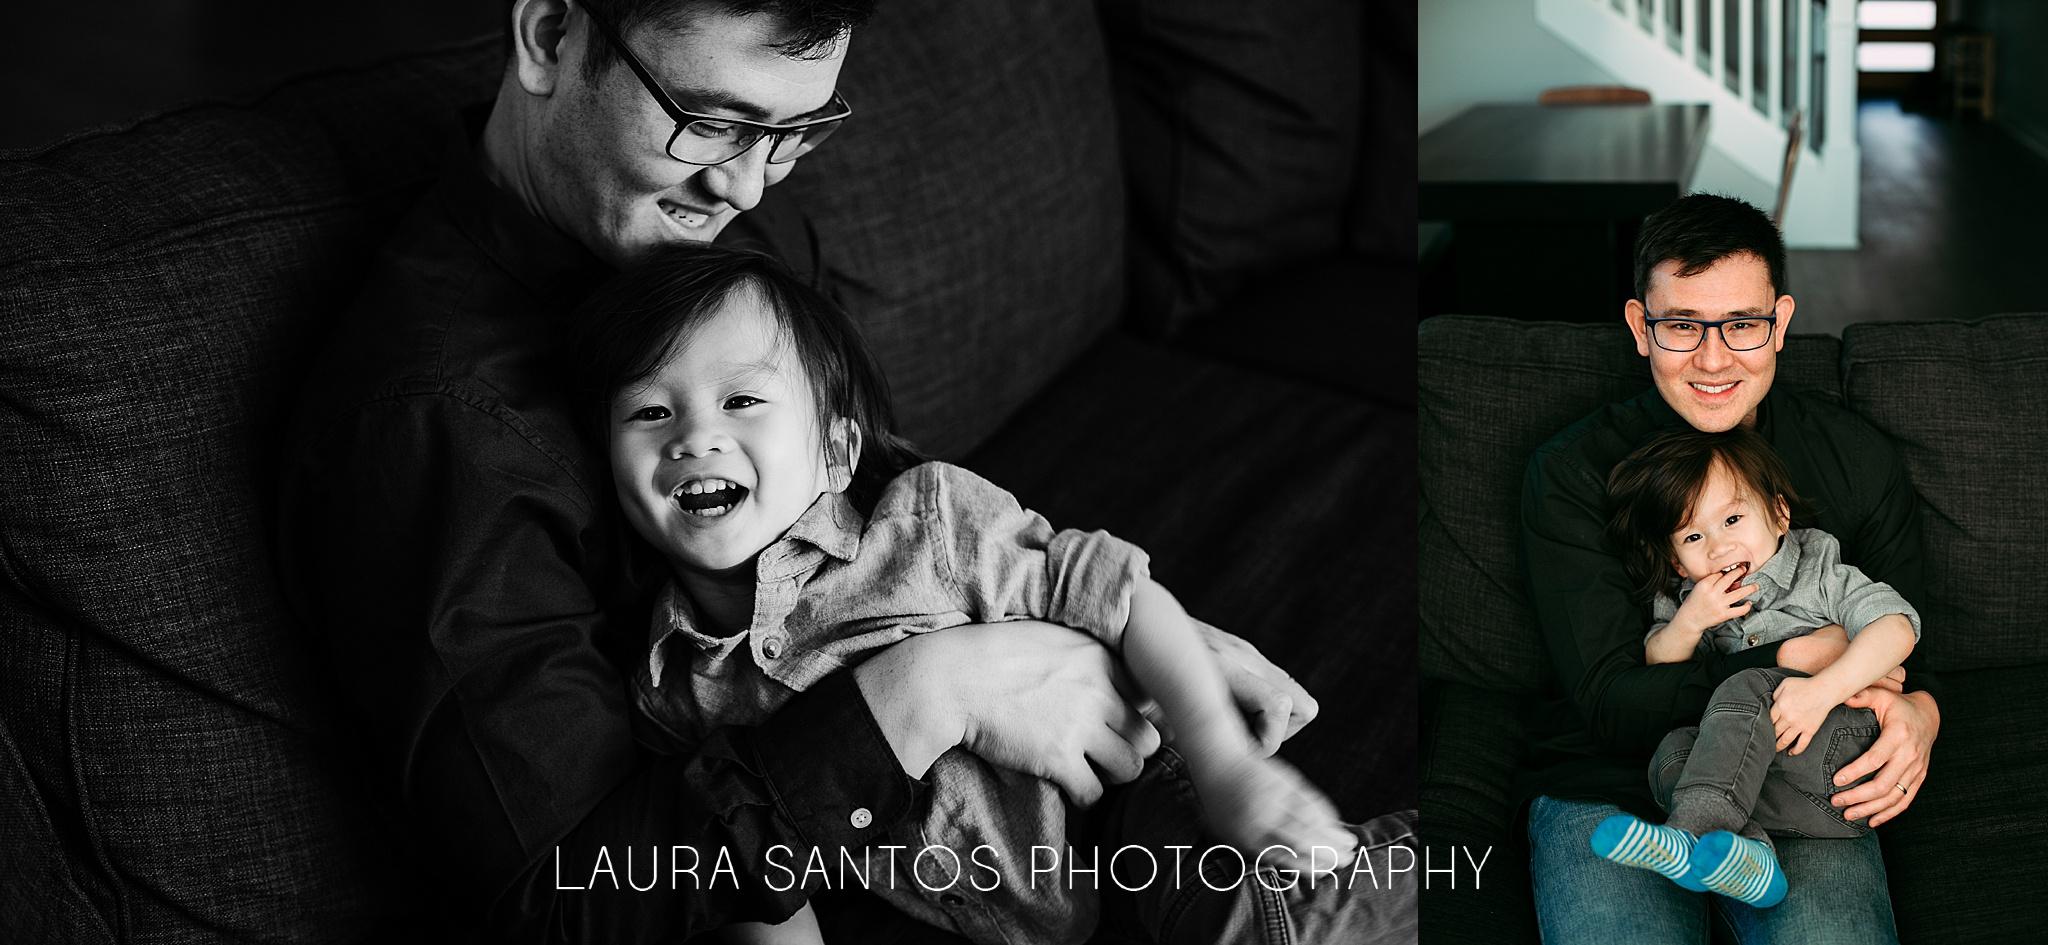 Laura Santos Photography Portland Oregon Family Photographer_0590.jpg